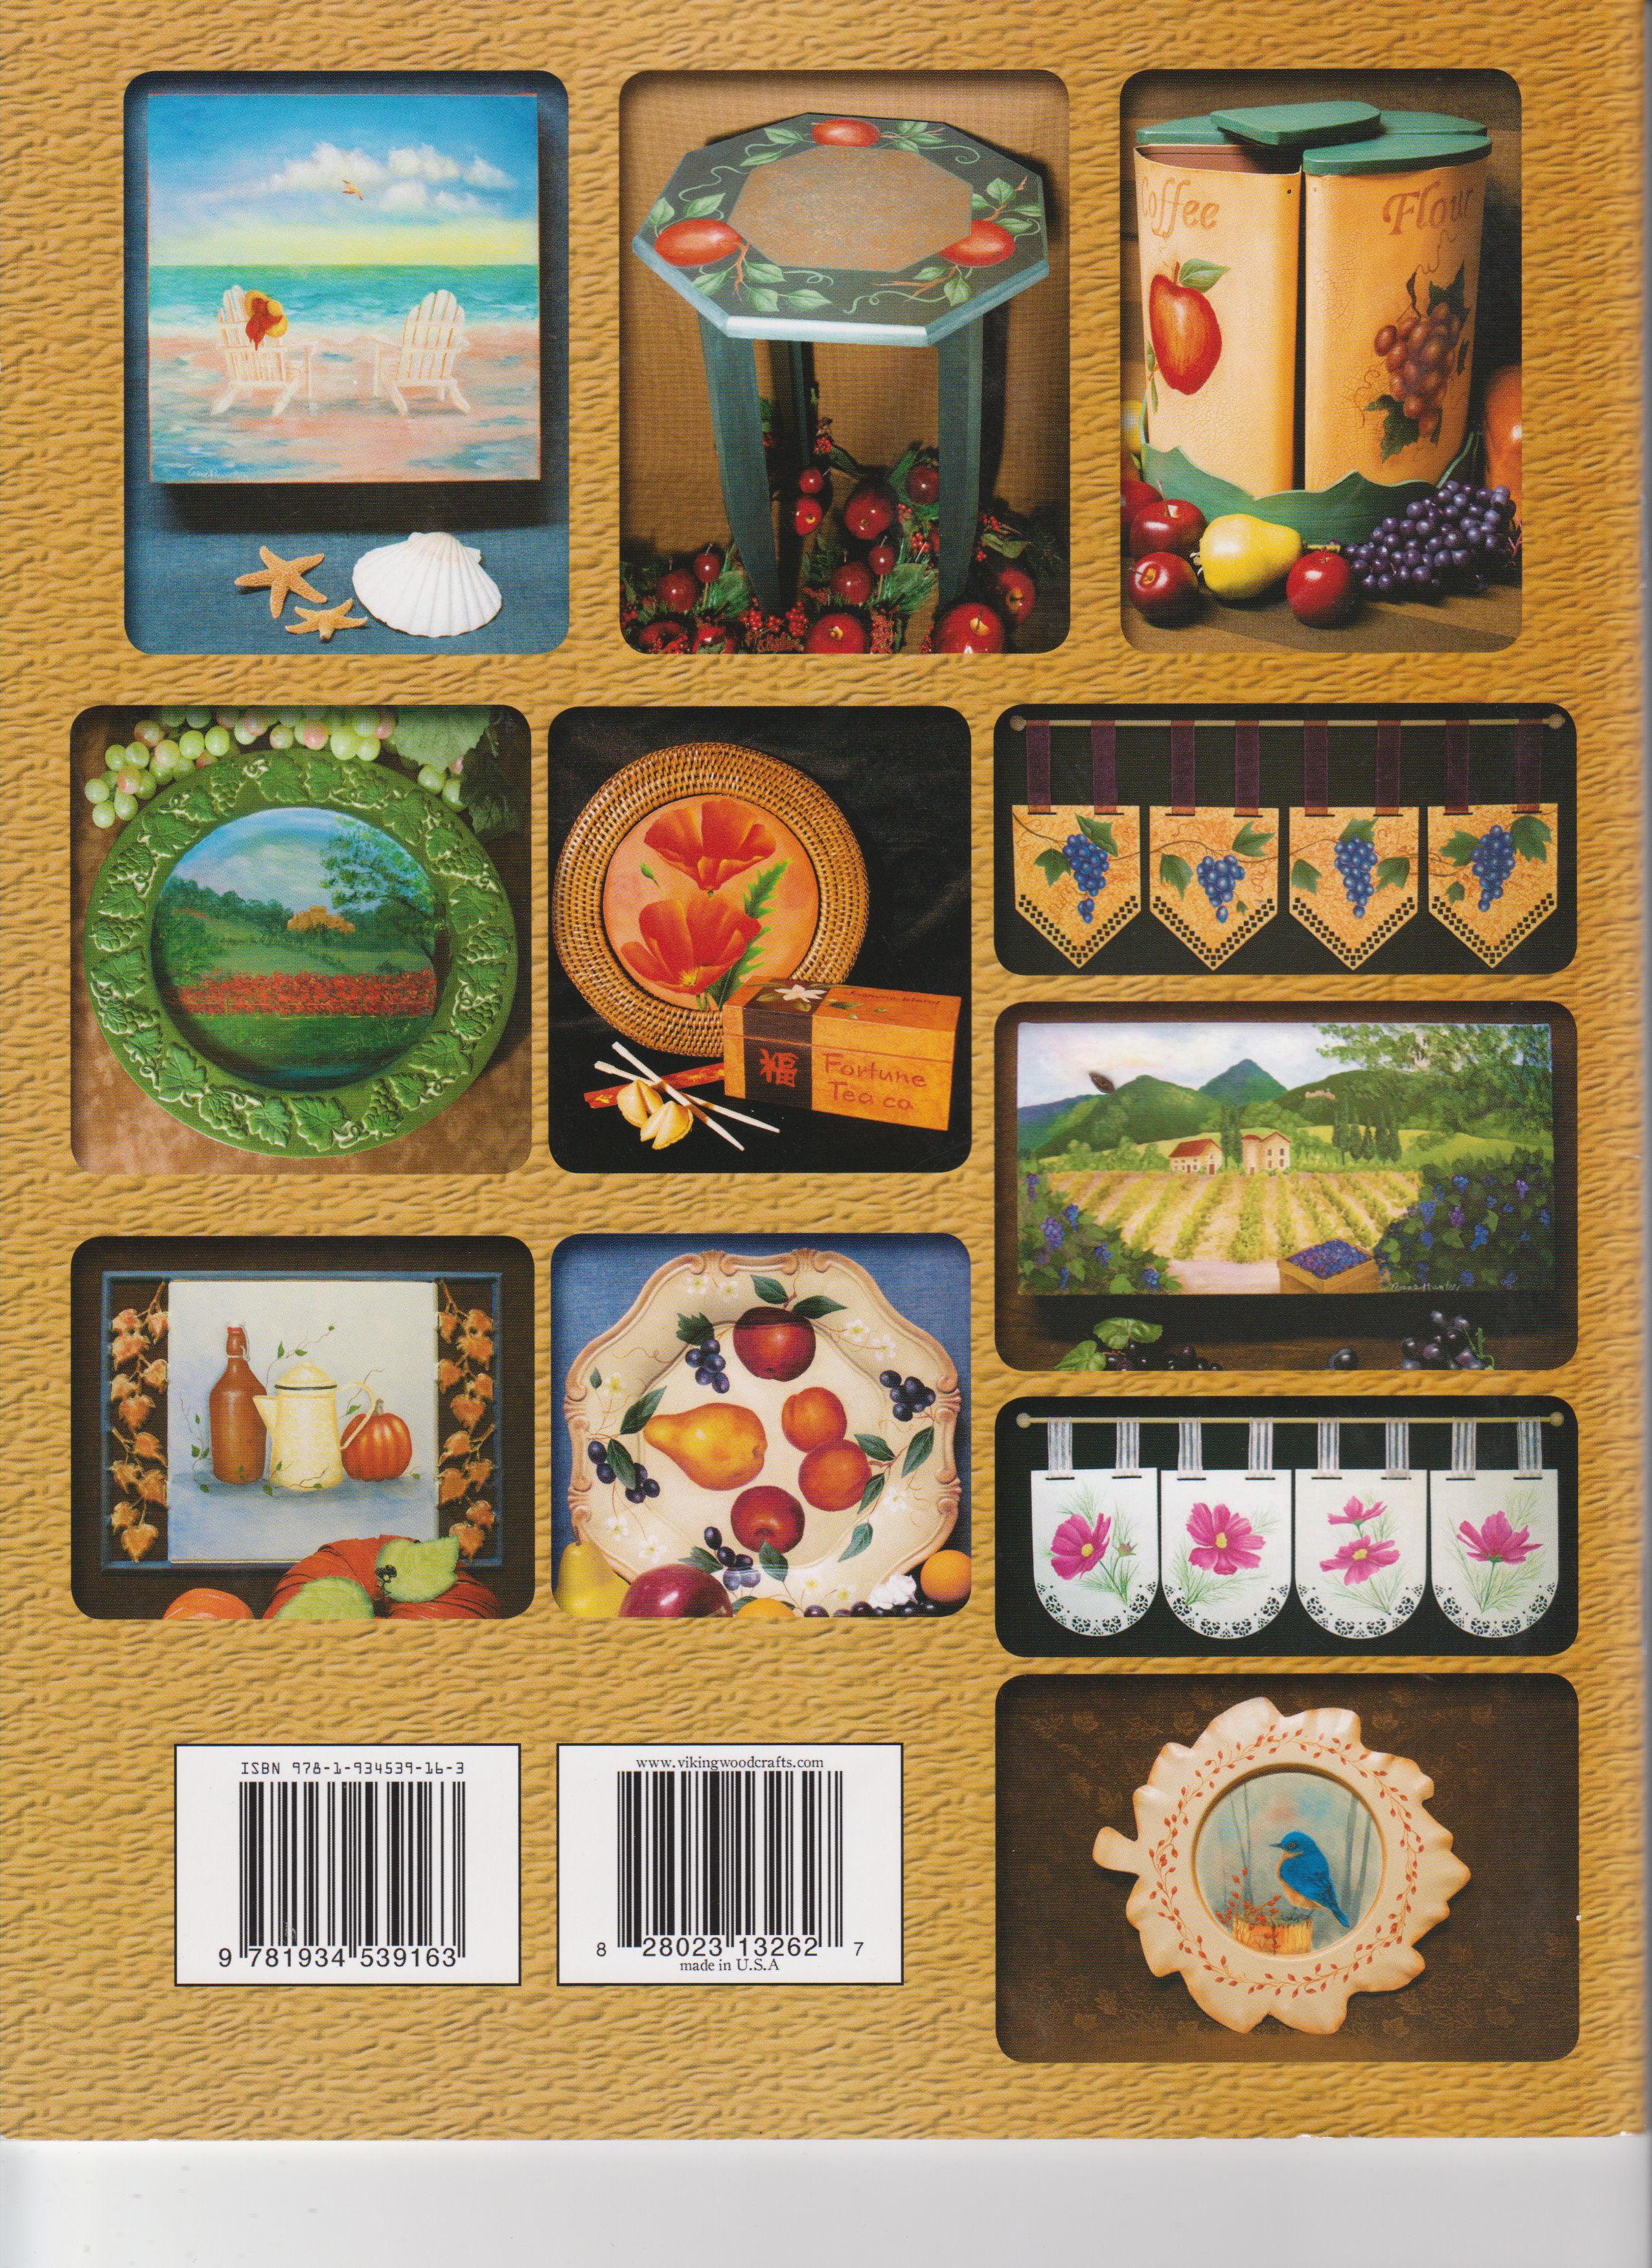 books-ah-finishing-touches-iv-tc-2802313262-sm.jpg